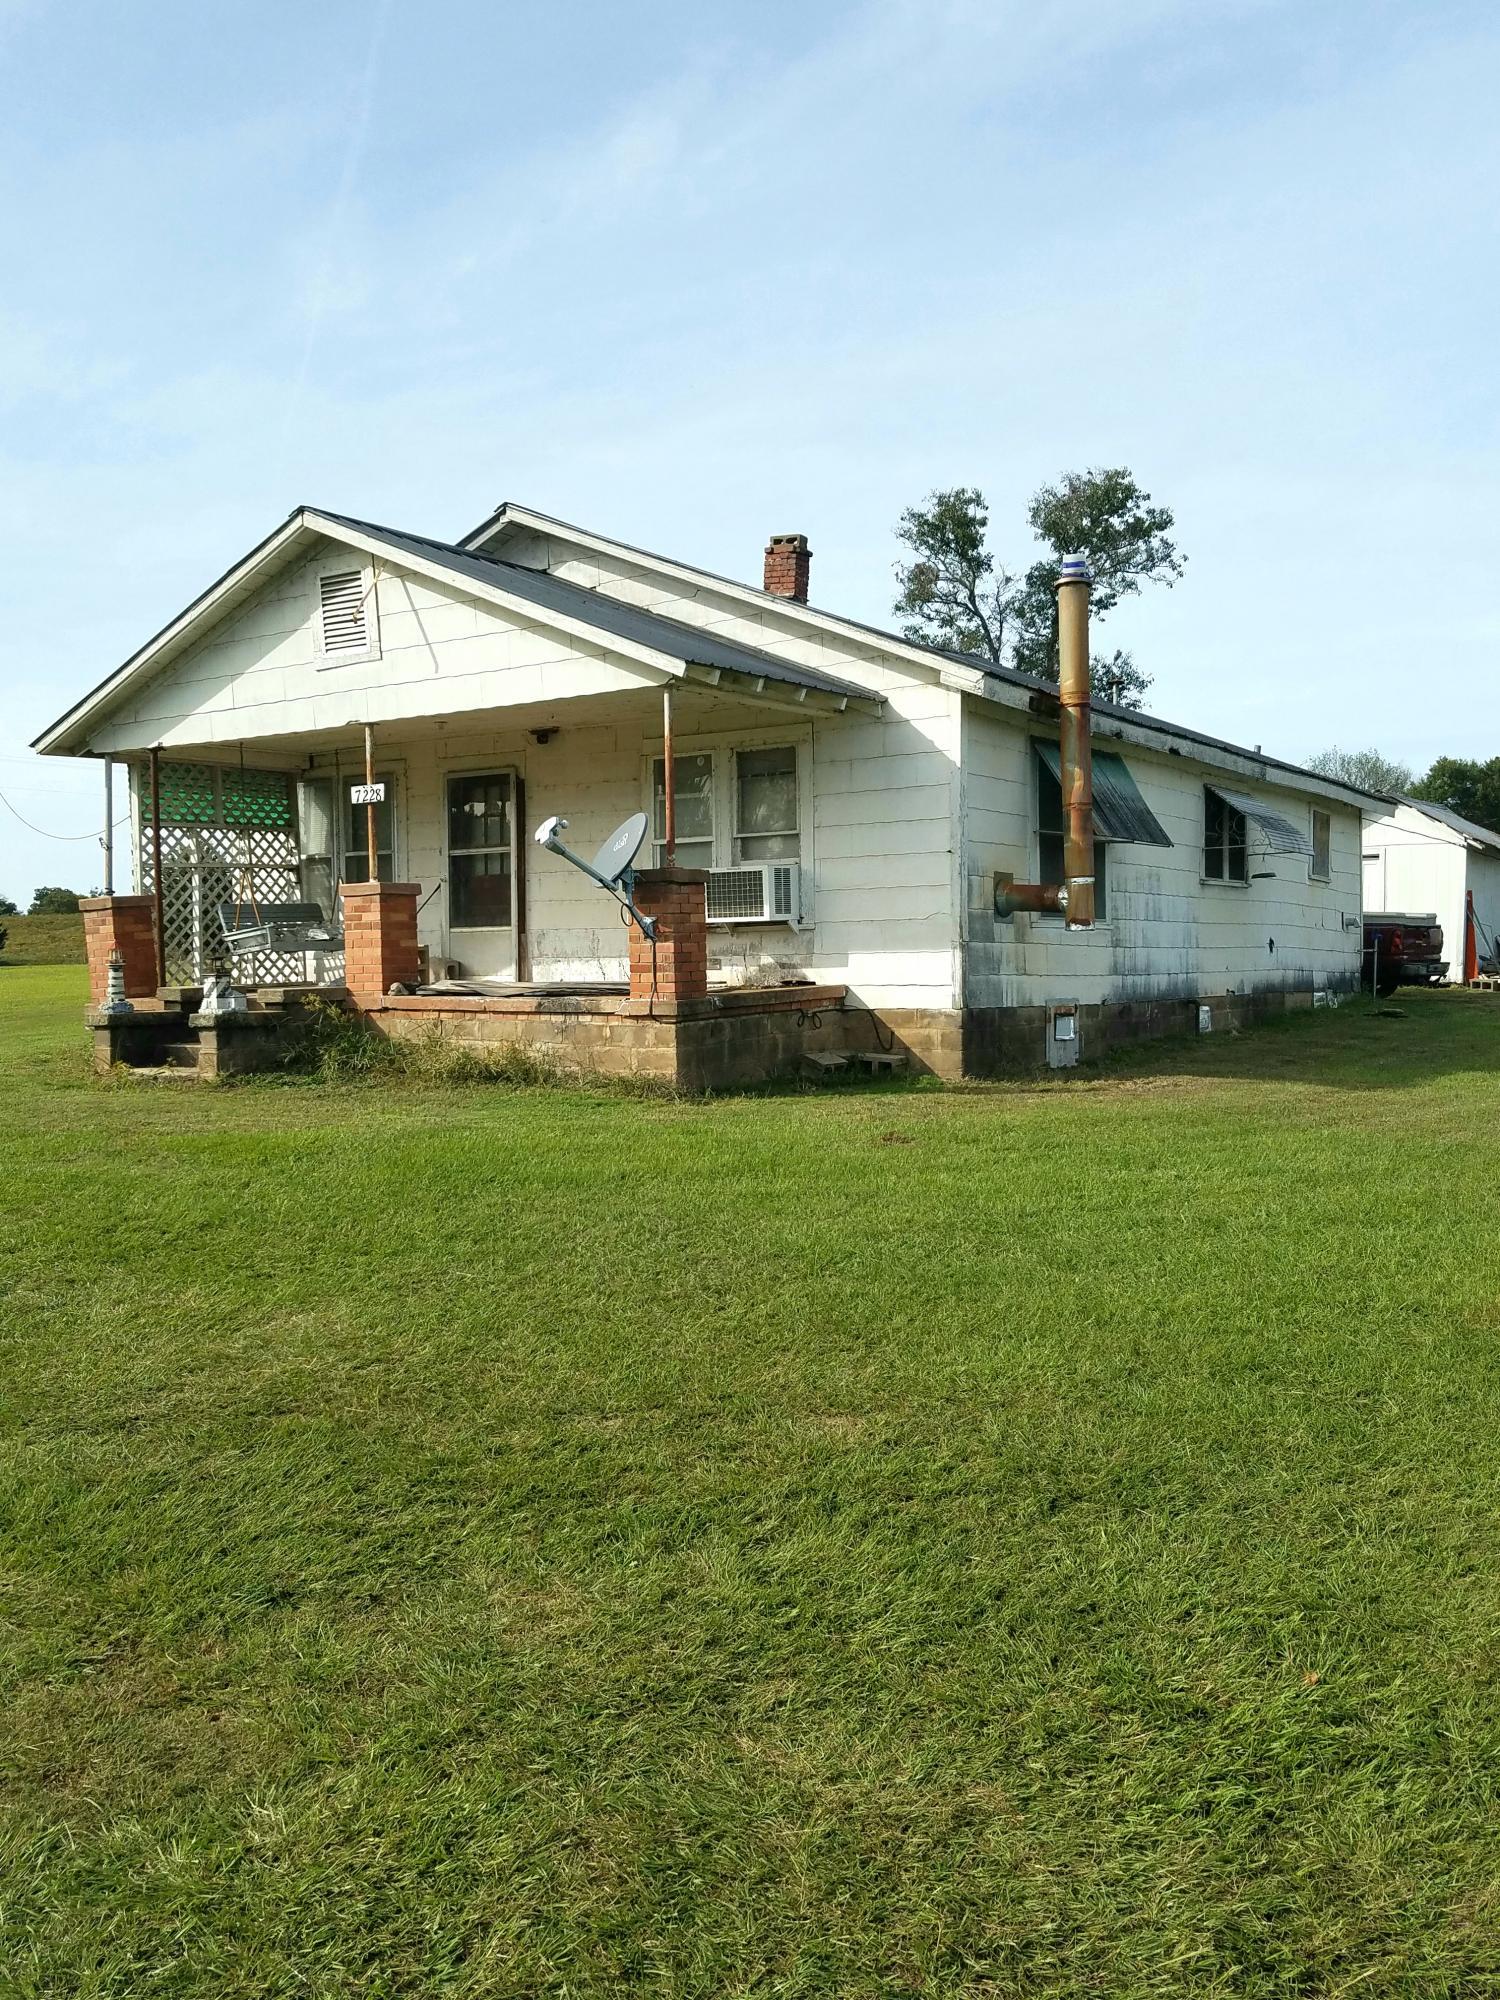 Main photo 3 of sold home in Hartman at 7228  Hwy 64 , Hartman, AR 72830